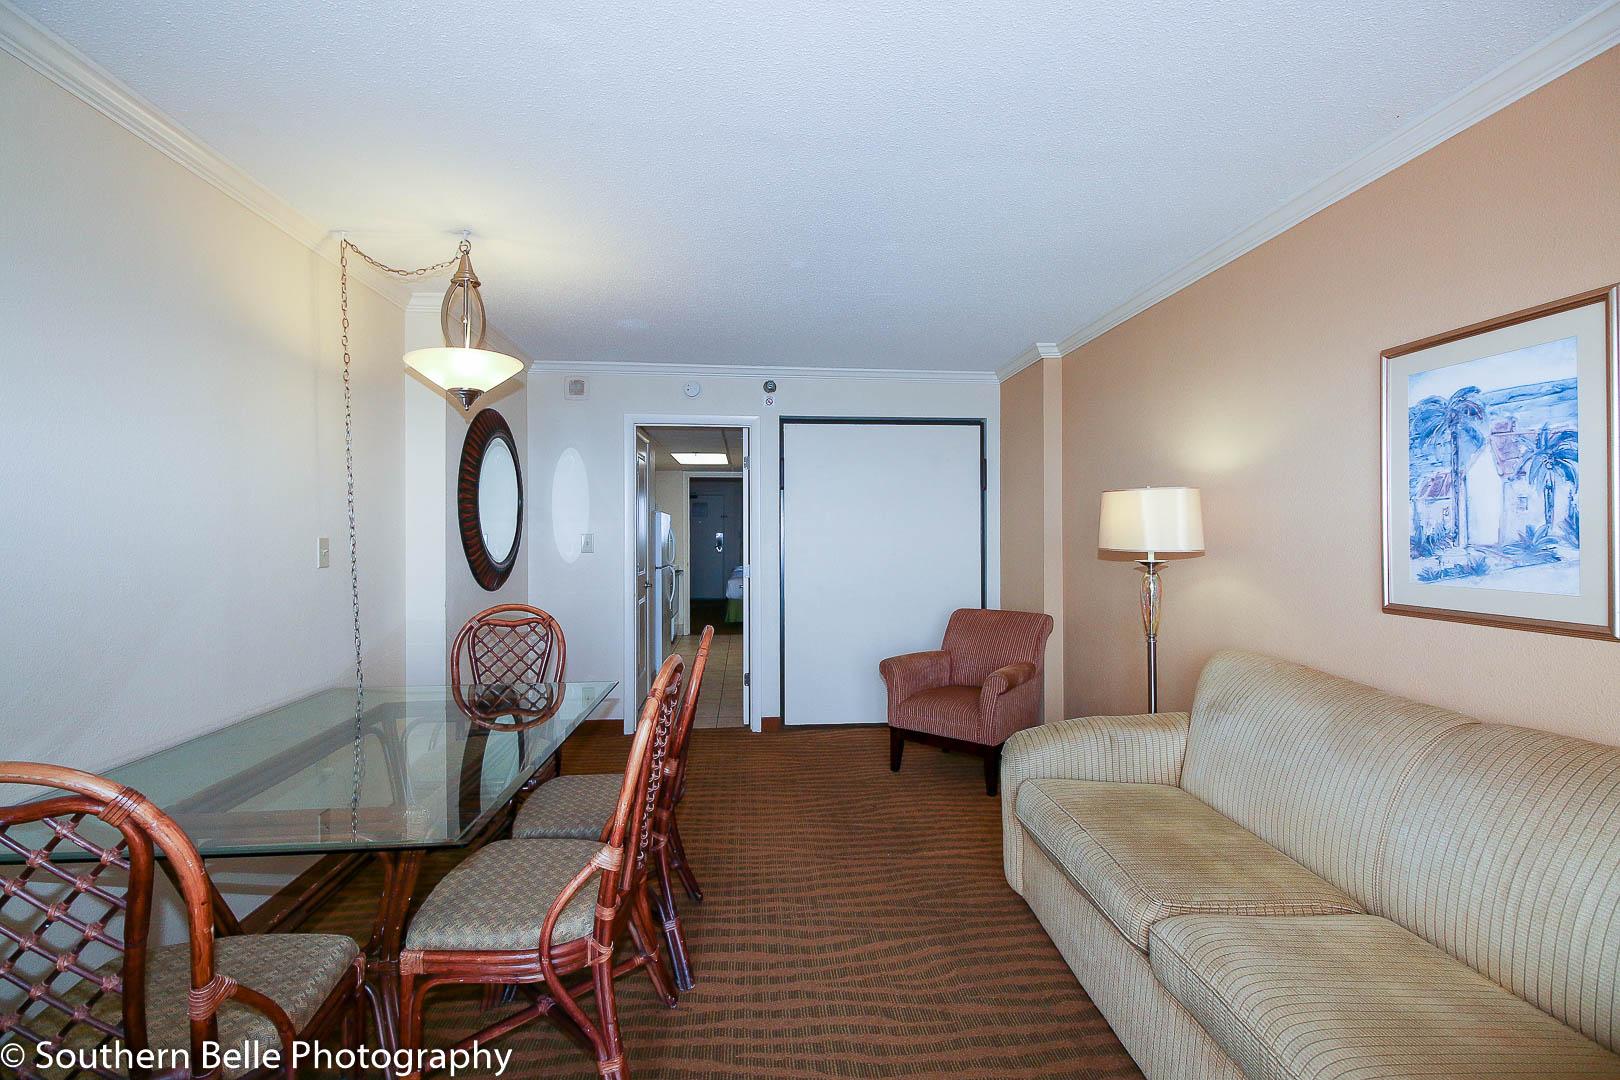 10. Livng Room View WM